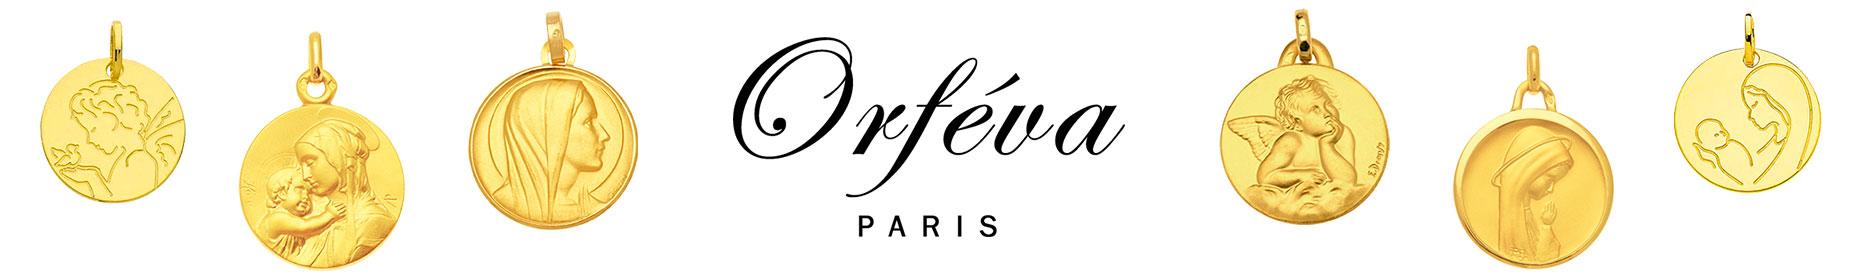 Medailles Orfeva